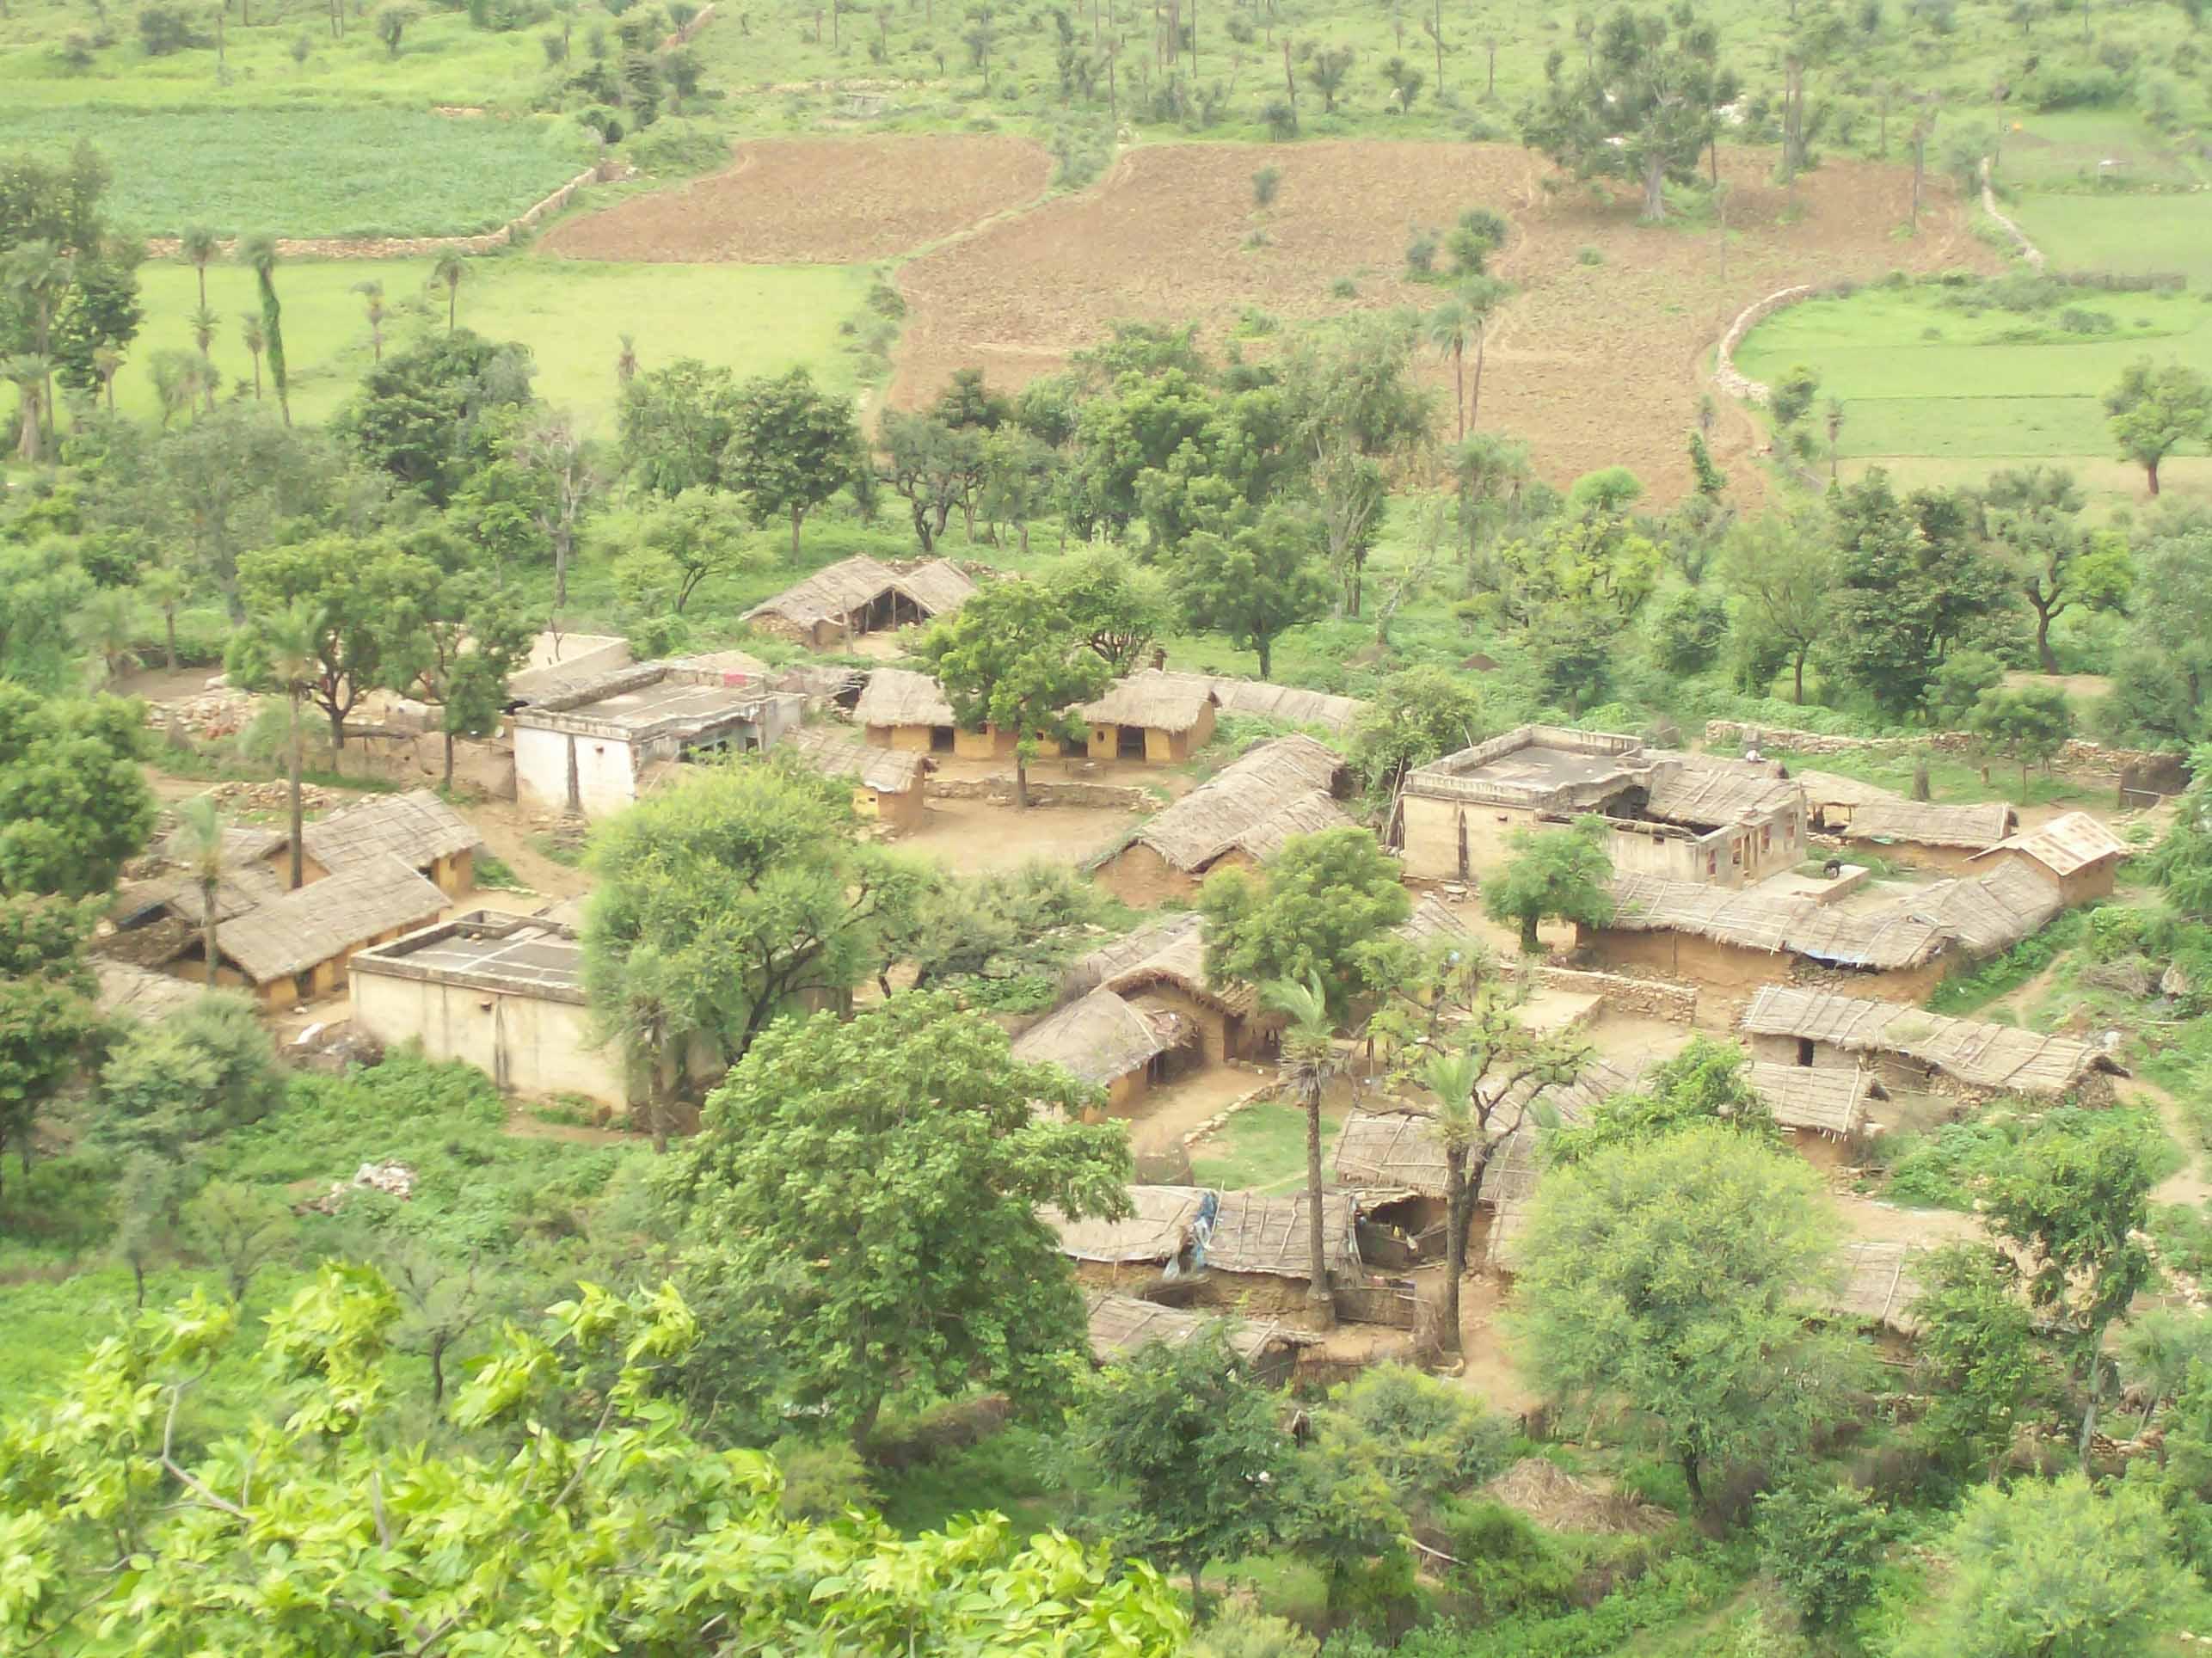 Jungle Mein Mangal - Village Dewari Gowada in the Aravali ...